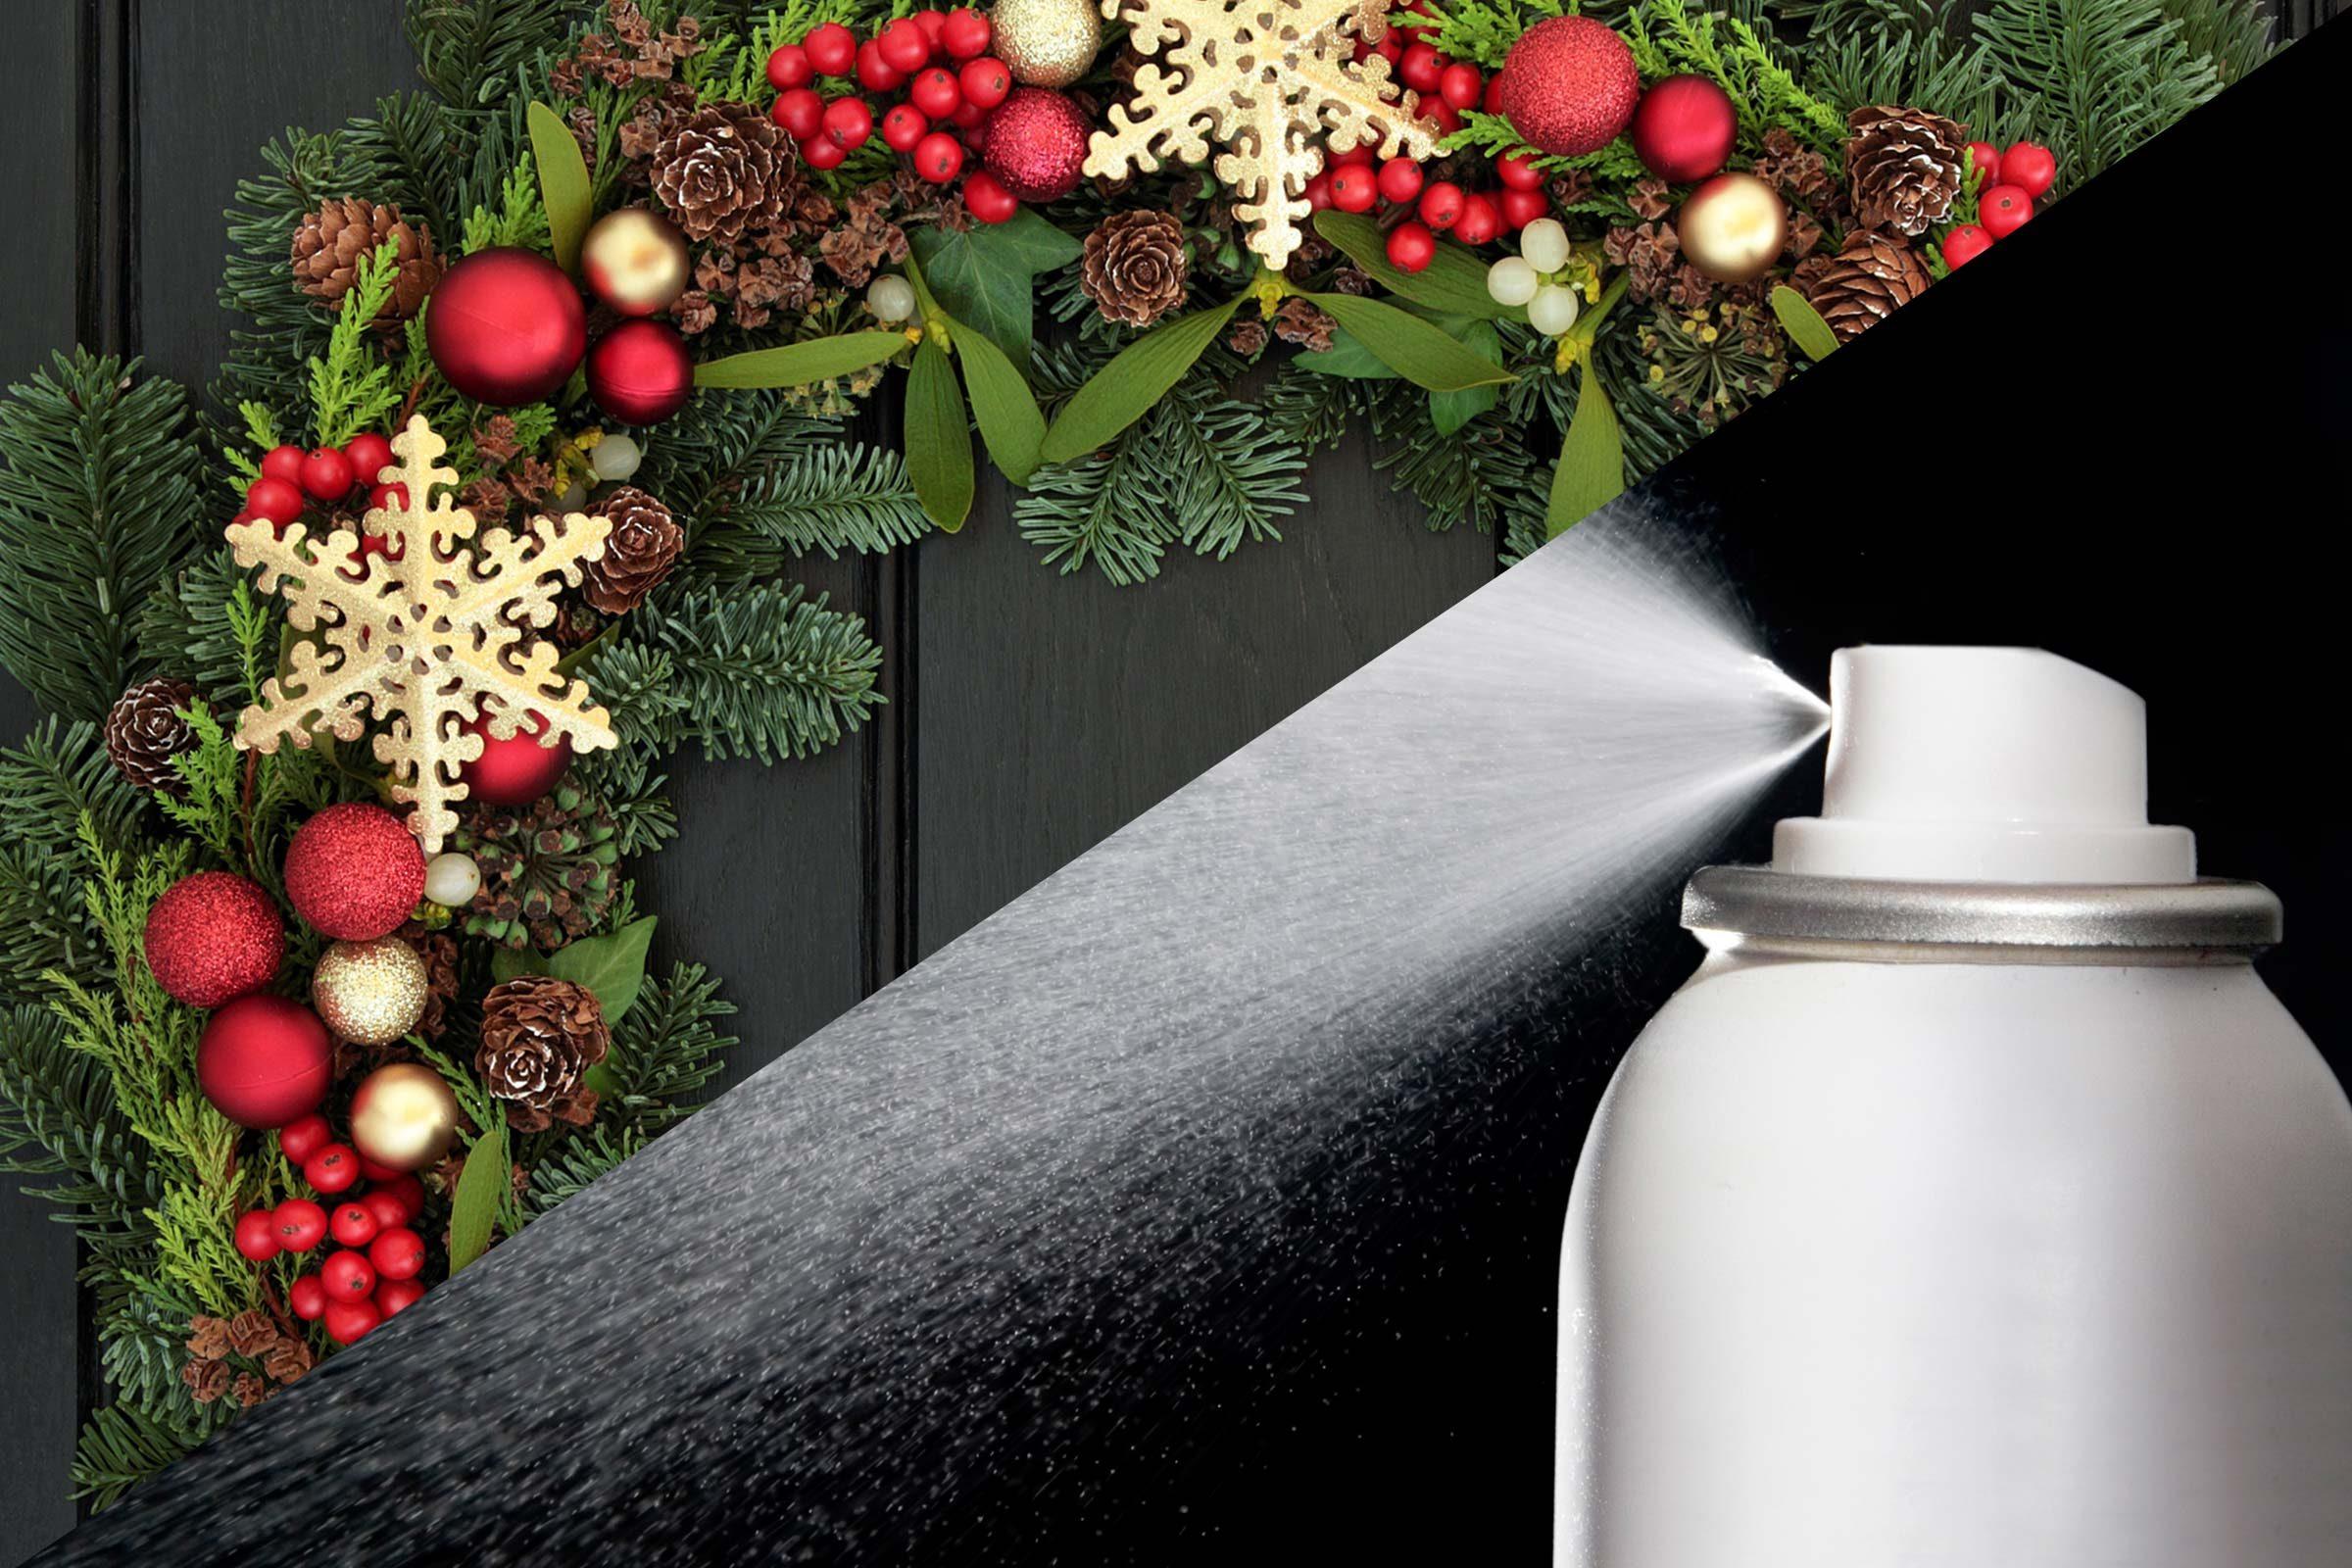 Preserve a Christmas wreath